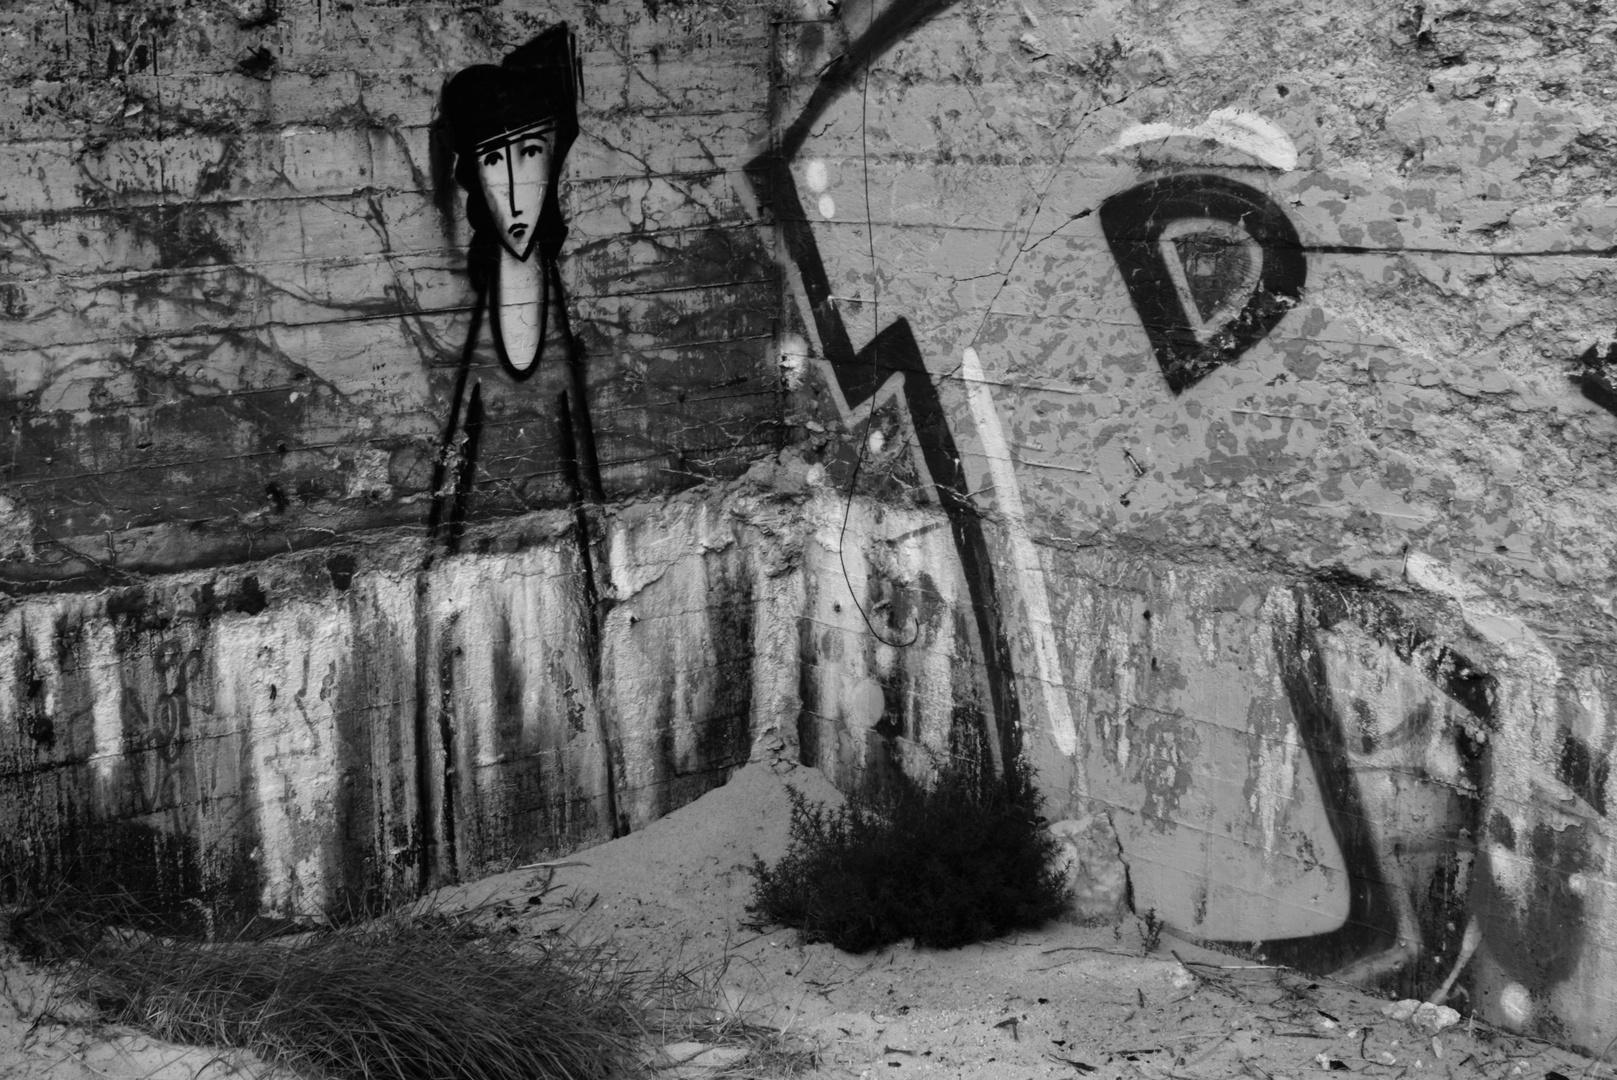 Graffiti macht graue Wände lebendig